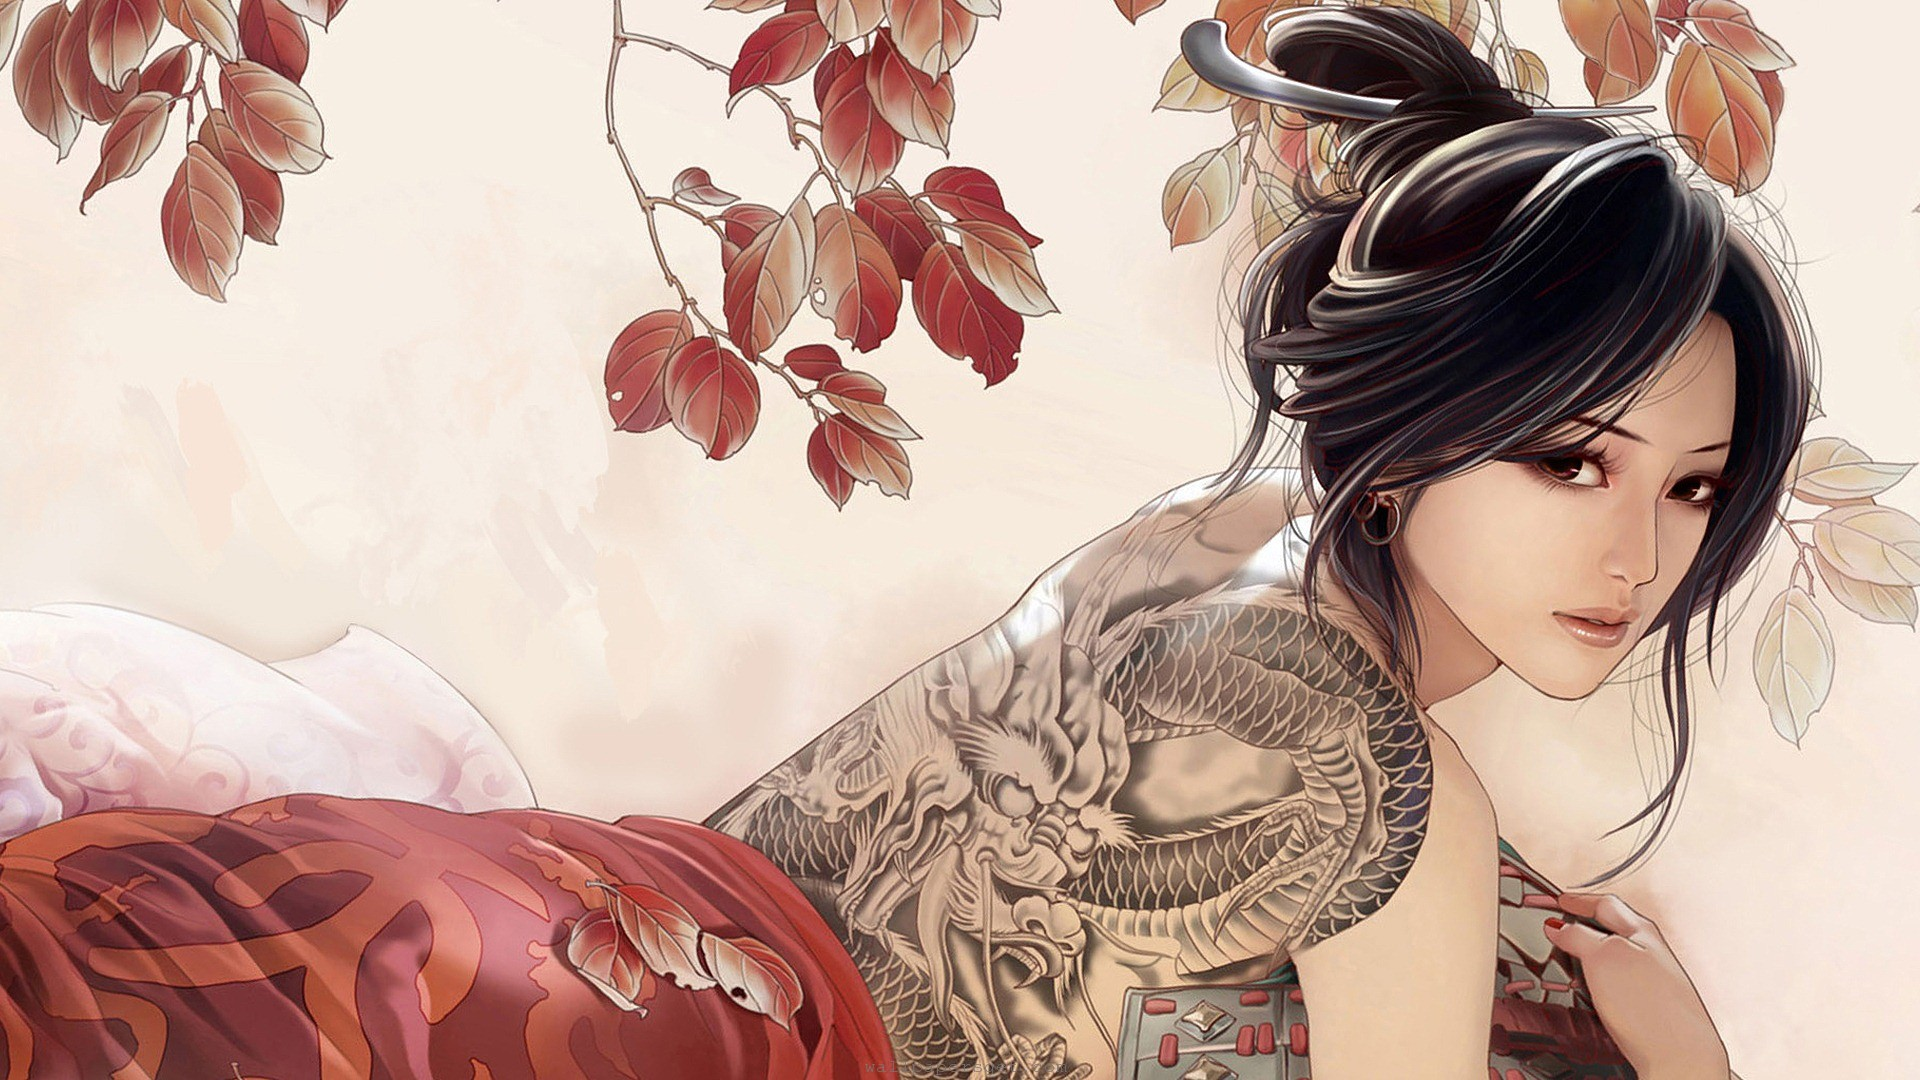 drawings of oriental women | Beautiful wallpapers girl asian